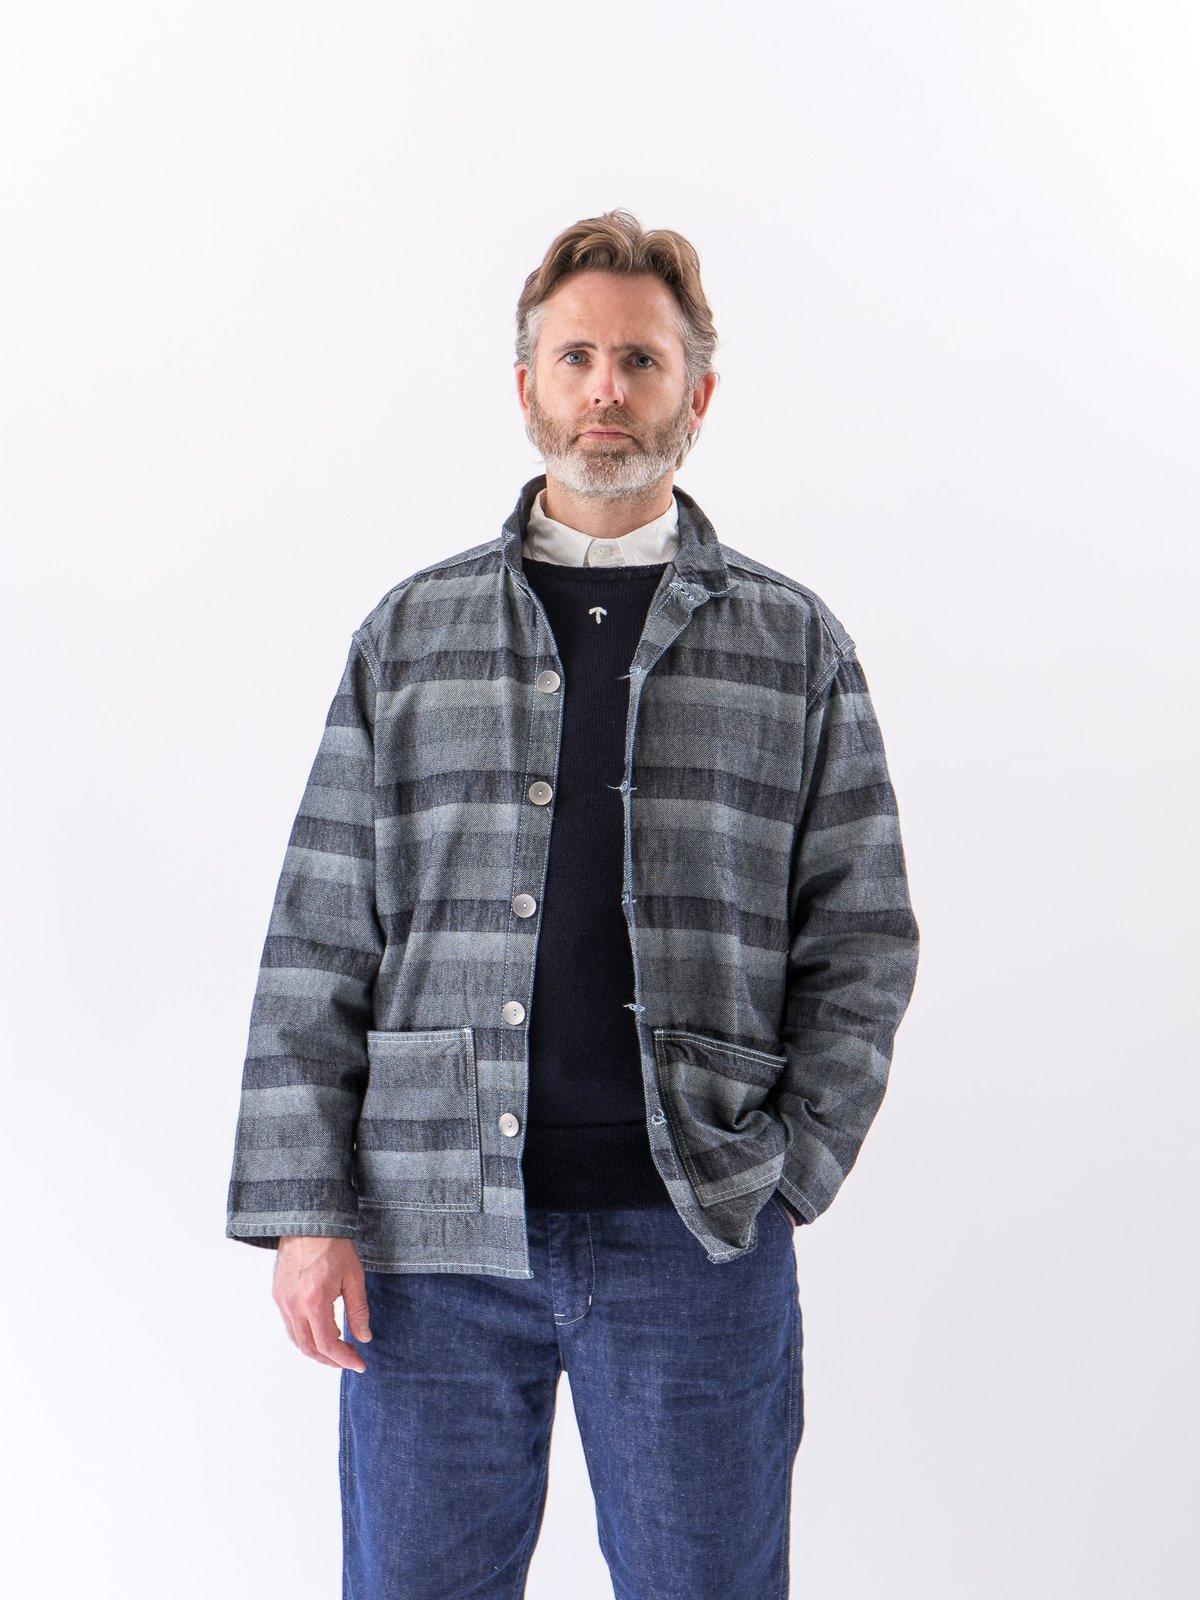 Rinse Washed Indigo Weaver's Blanket Stripe Floor Shirt - Image 3